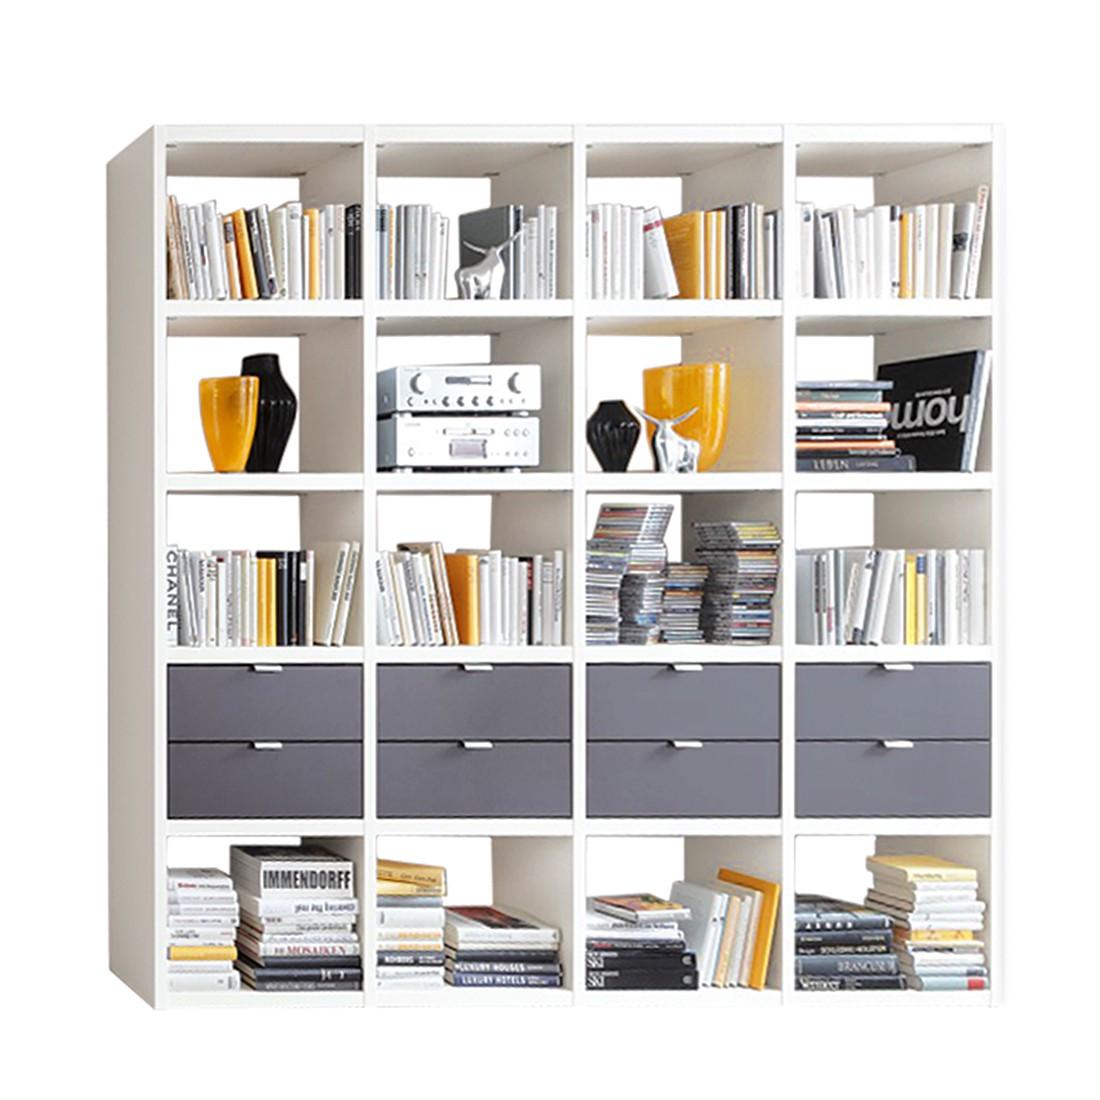 Bücherregal Cospaia II - Weiß/Anthrazit